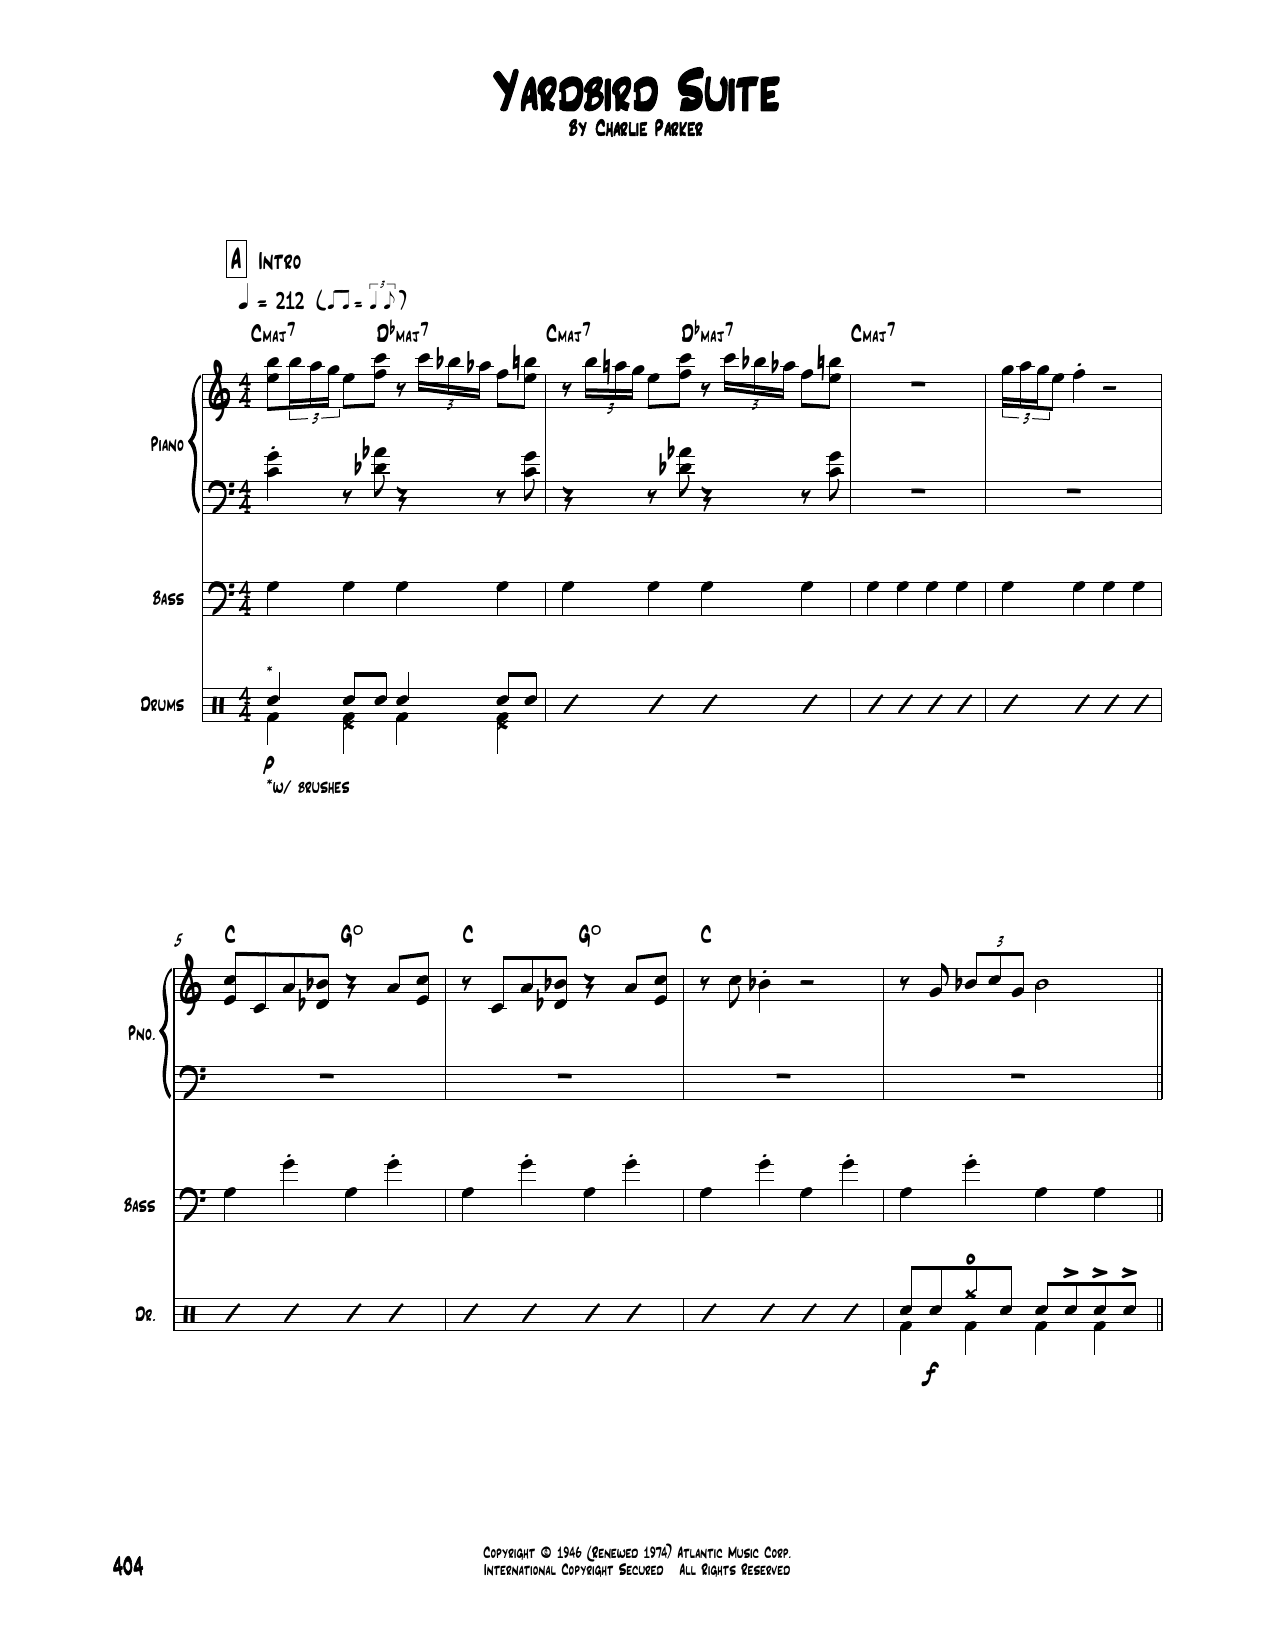 Yardbird Suite sheet music